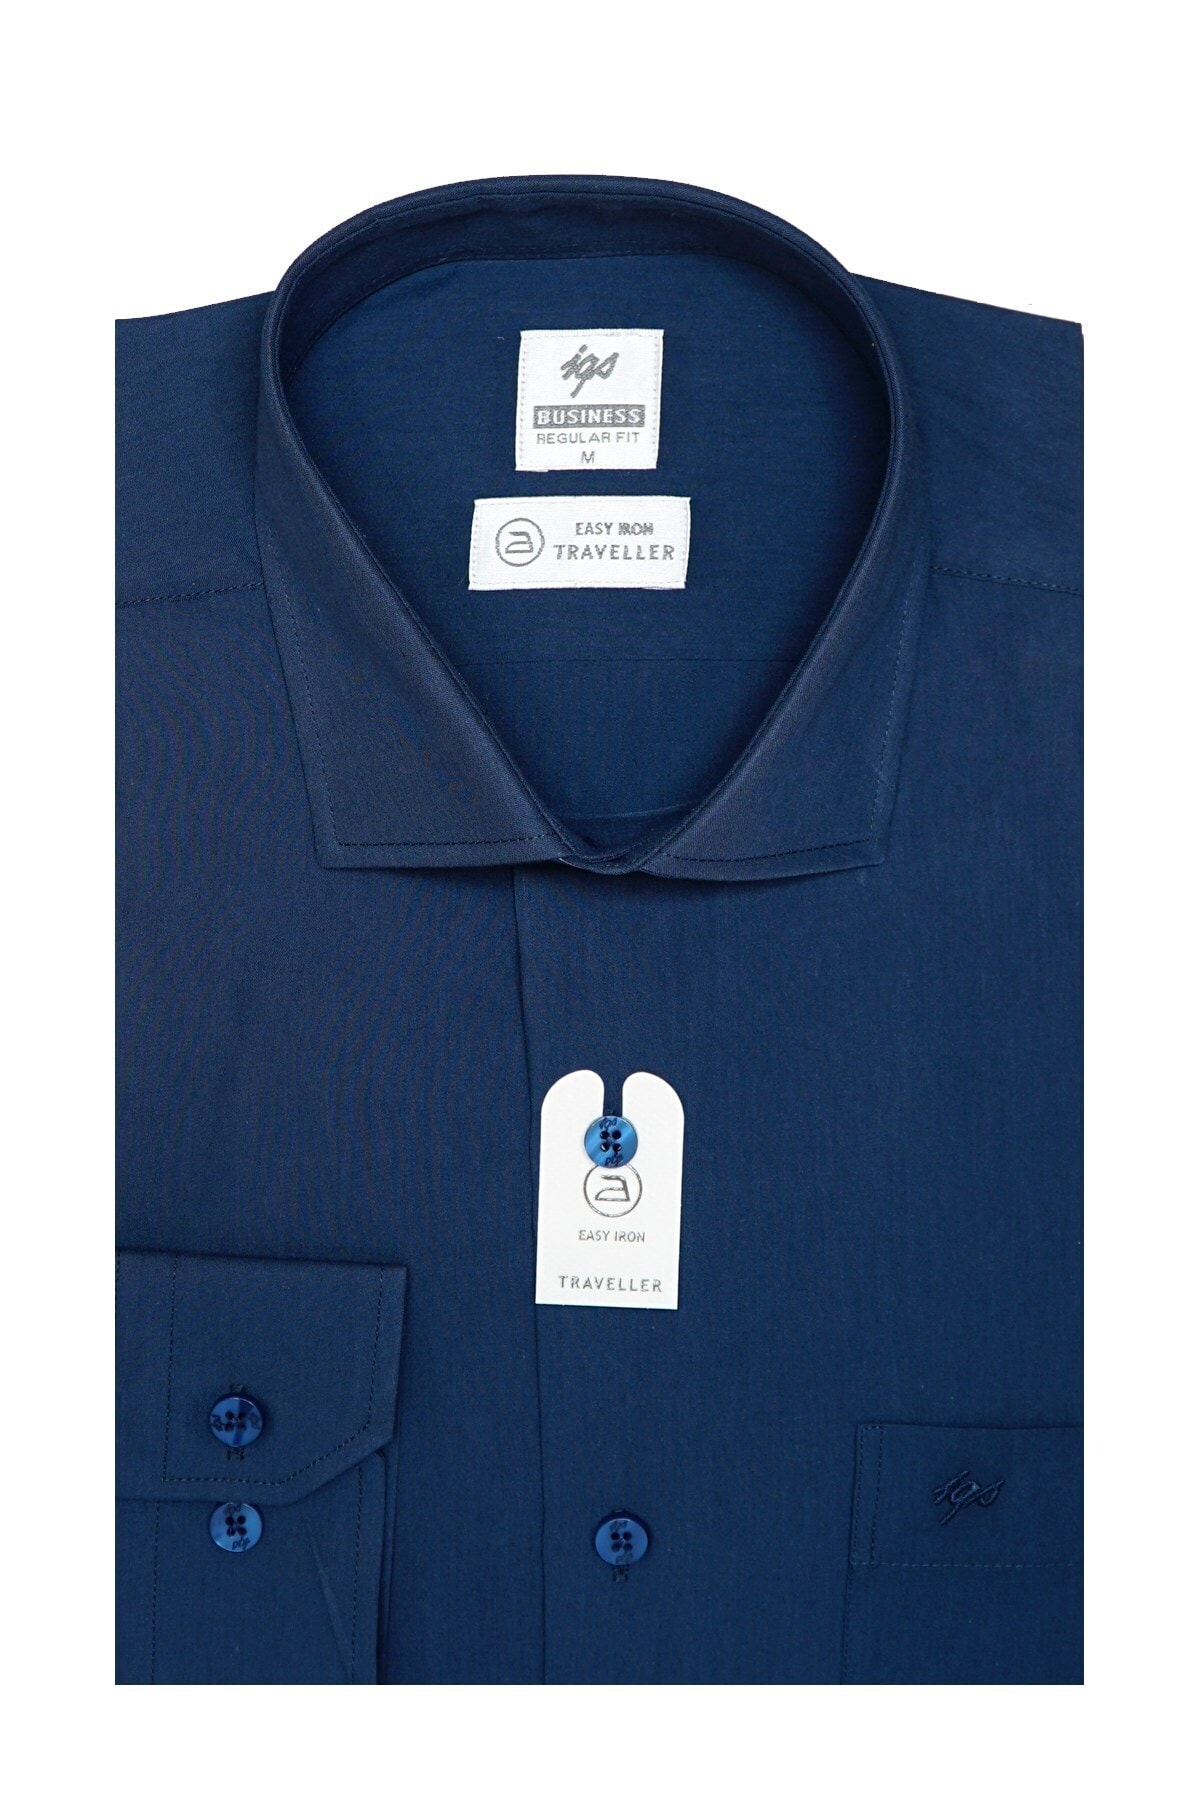 İgs Erkek Petrol Regularfıt / Rahat Kalıp 7 Cm Klasik Gömlek 2